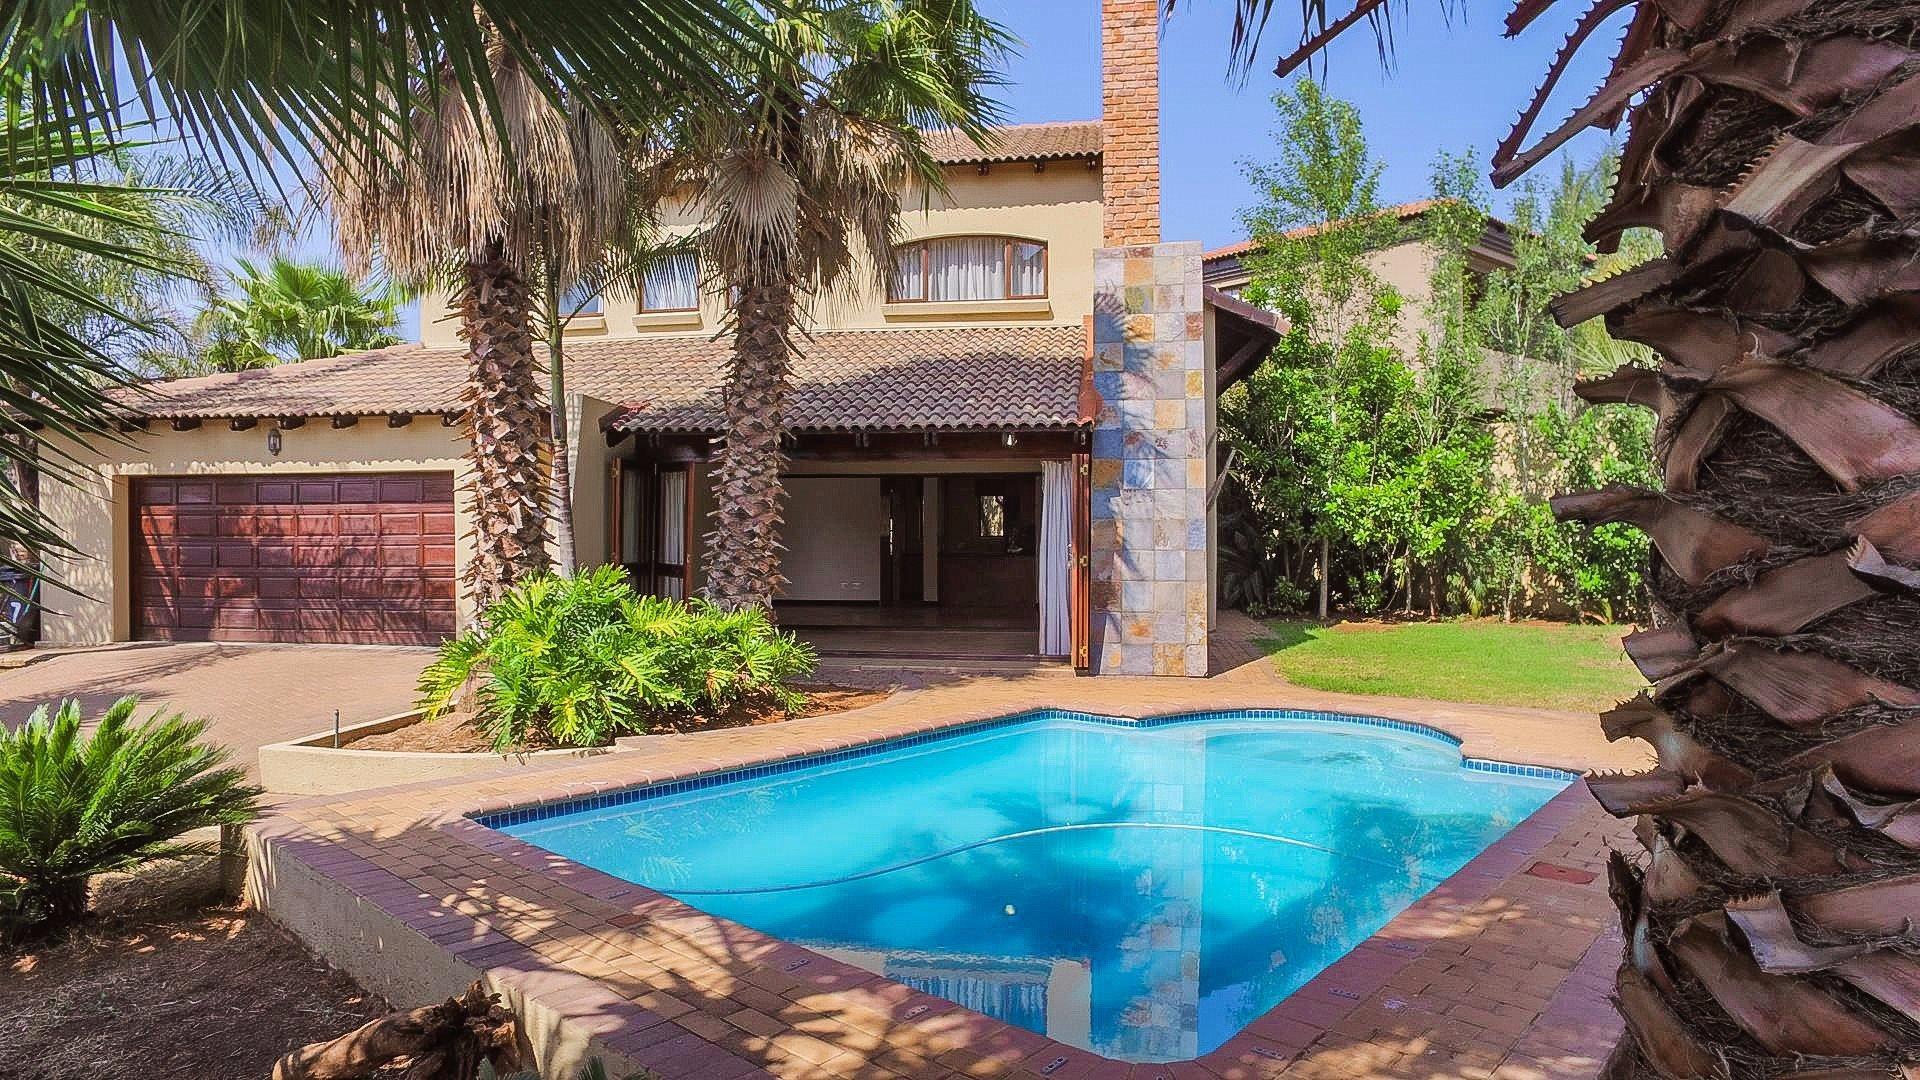 Irene View Estate property for sale. Ref No: 13519995. Picture no 27